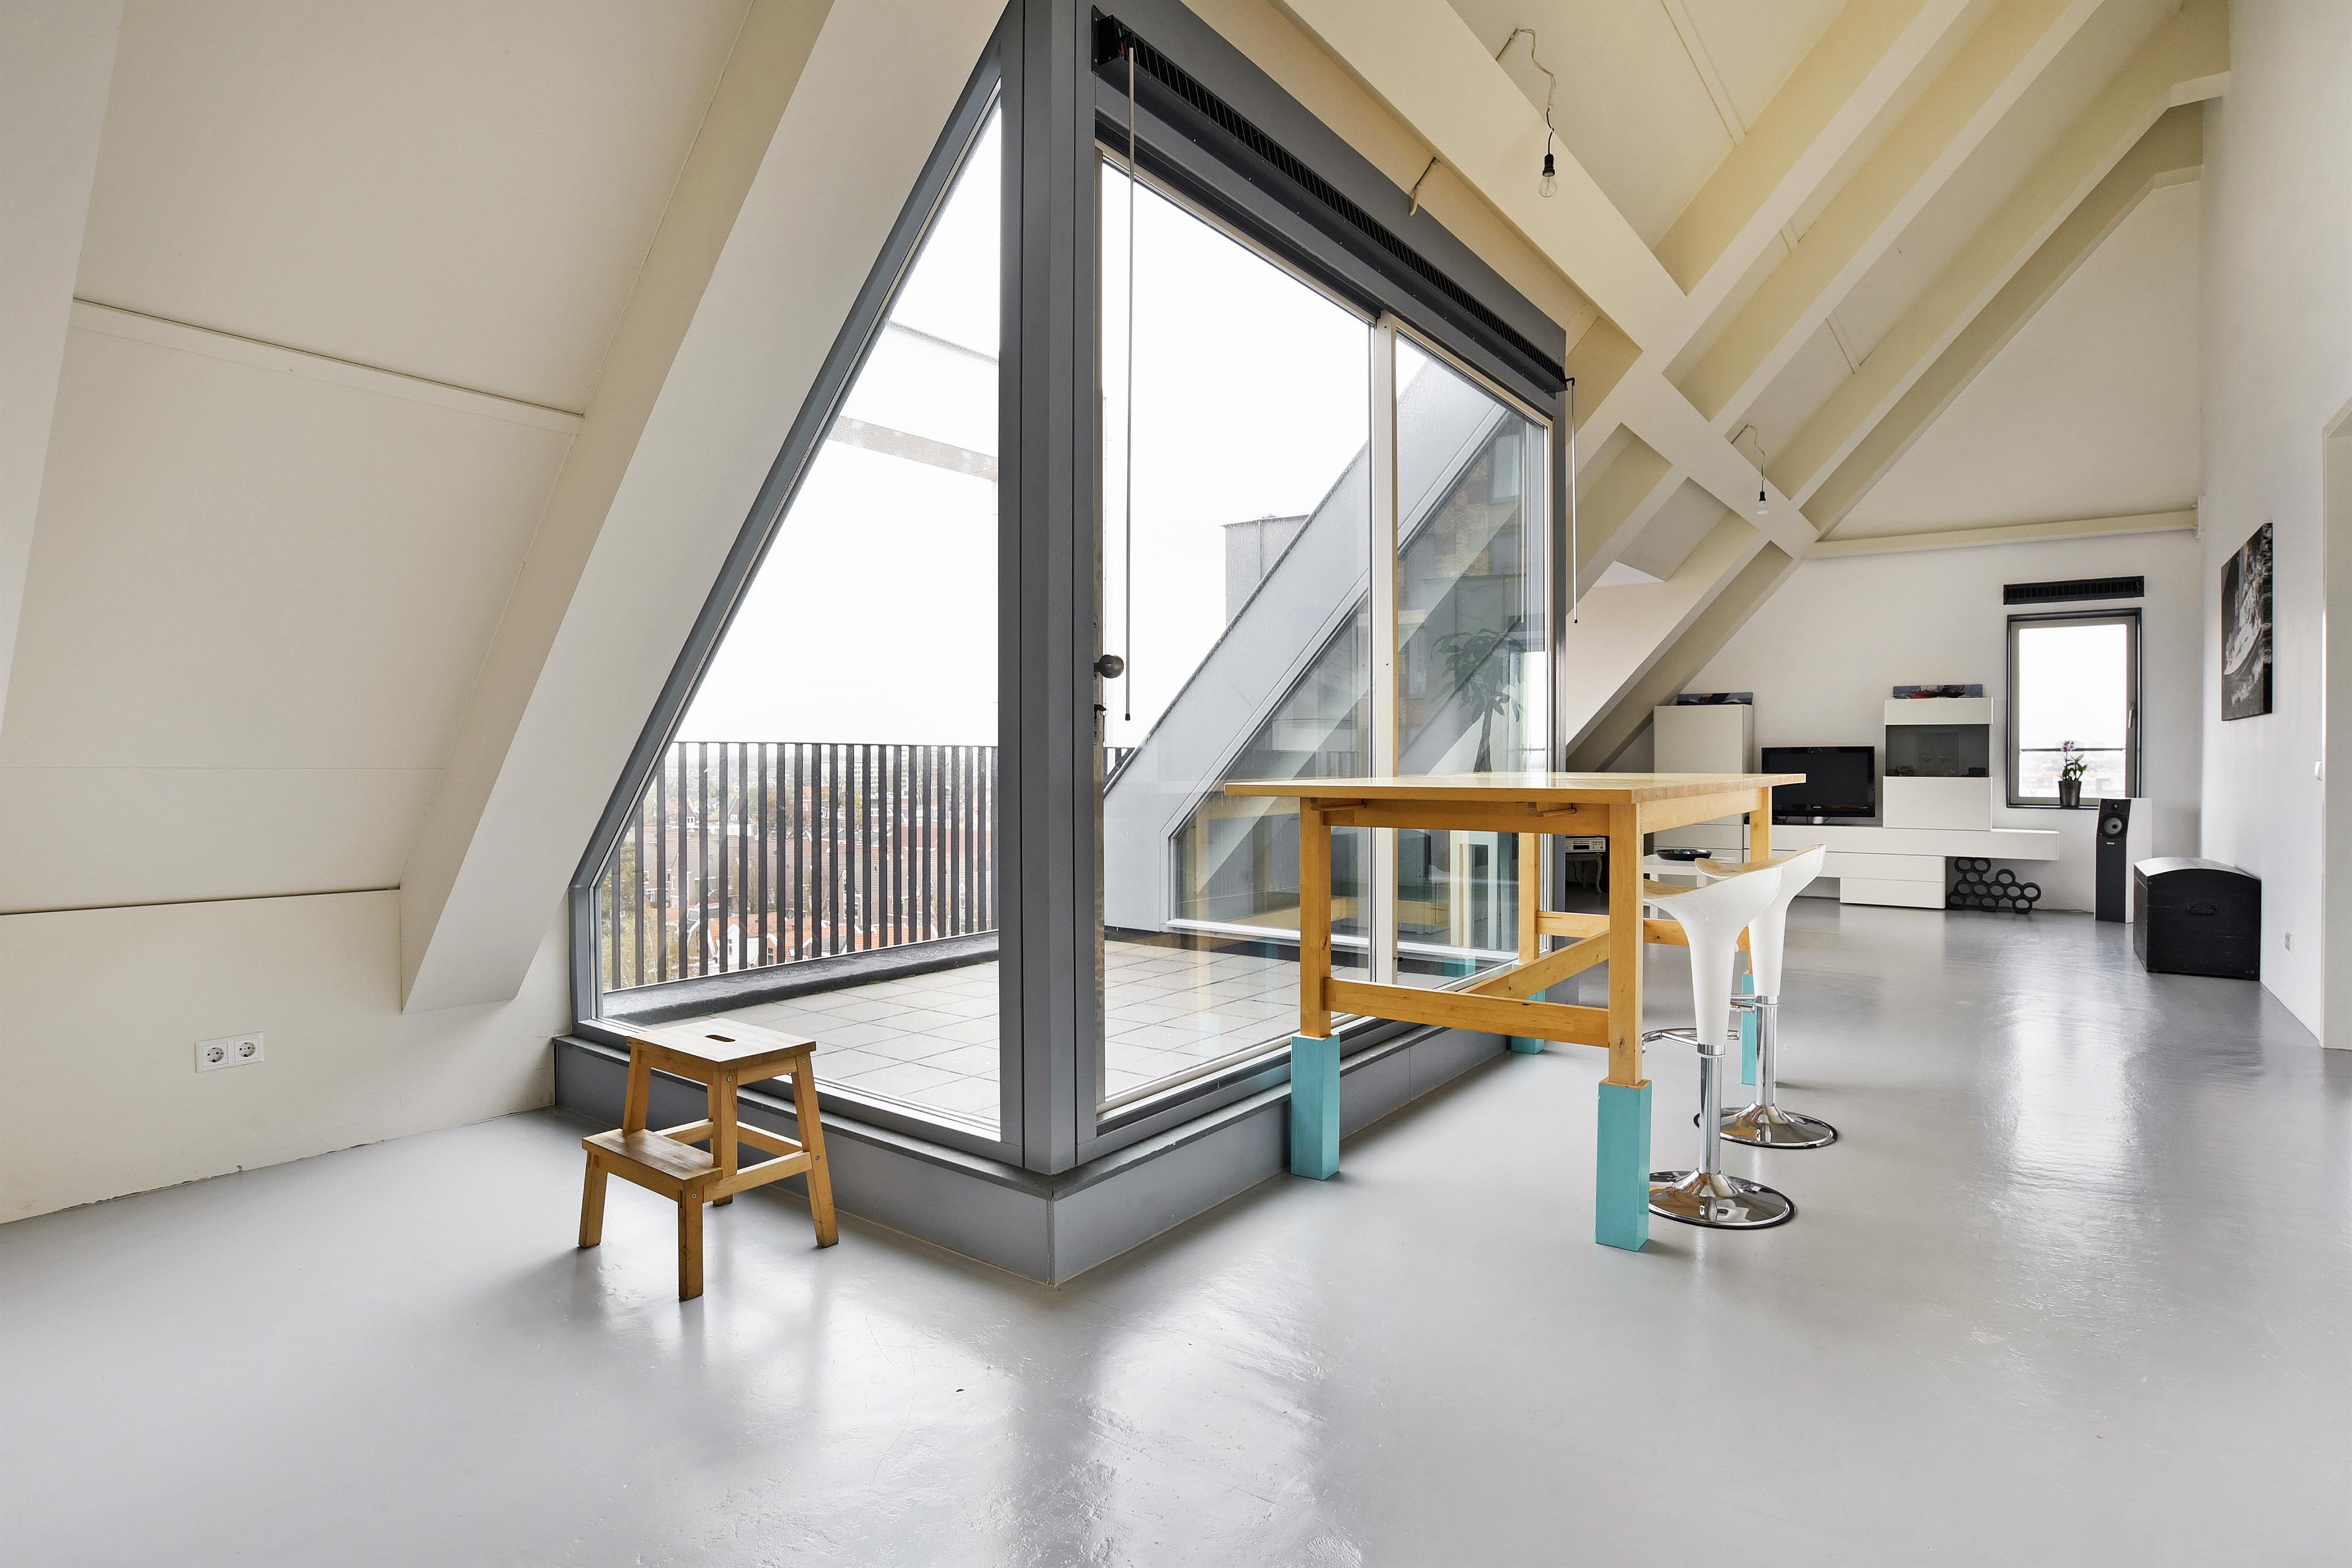 Te koop: Hermitage 84, Zaandam - Hoekstra en van Eck - Méér makelaar